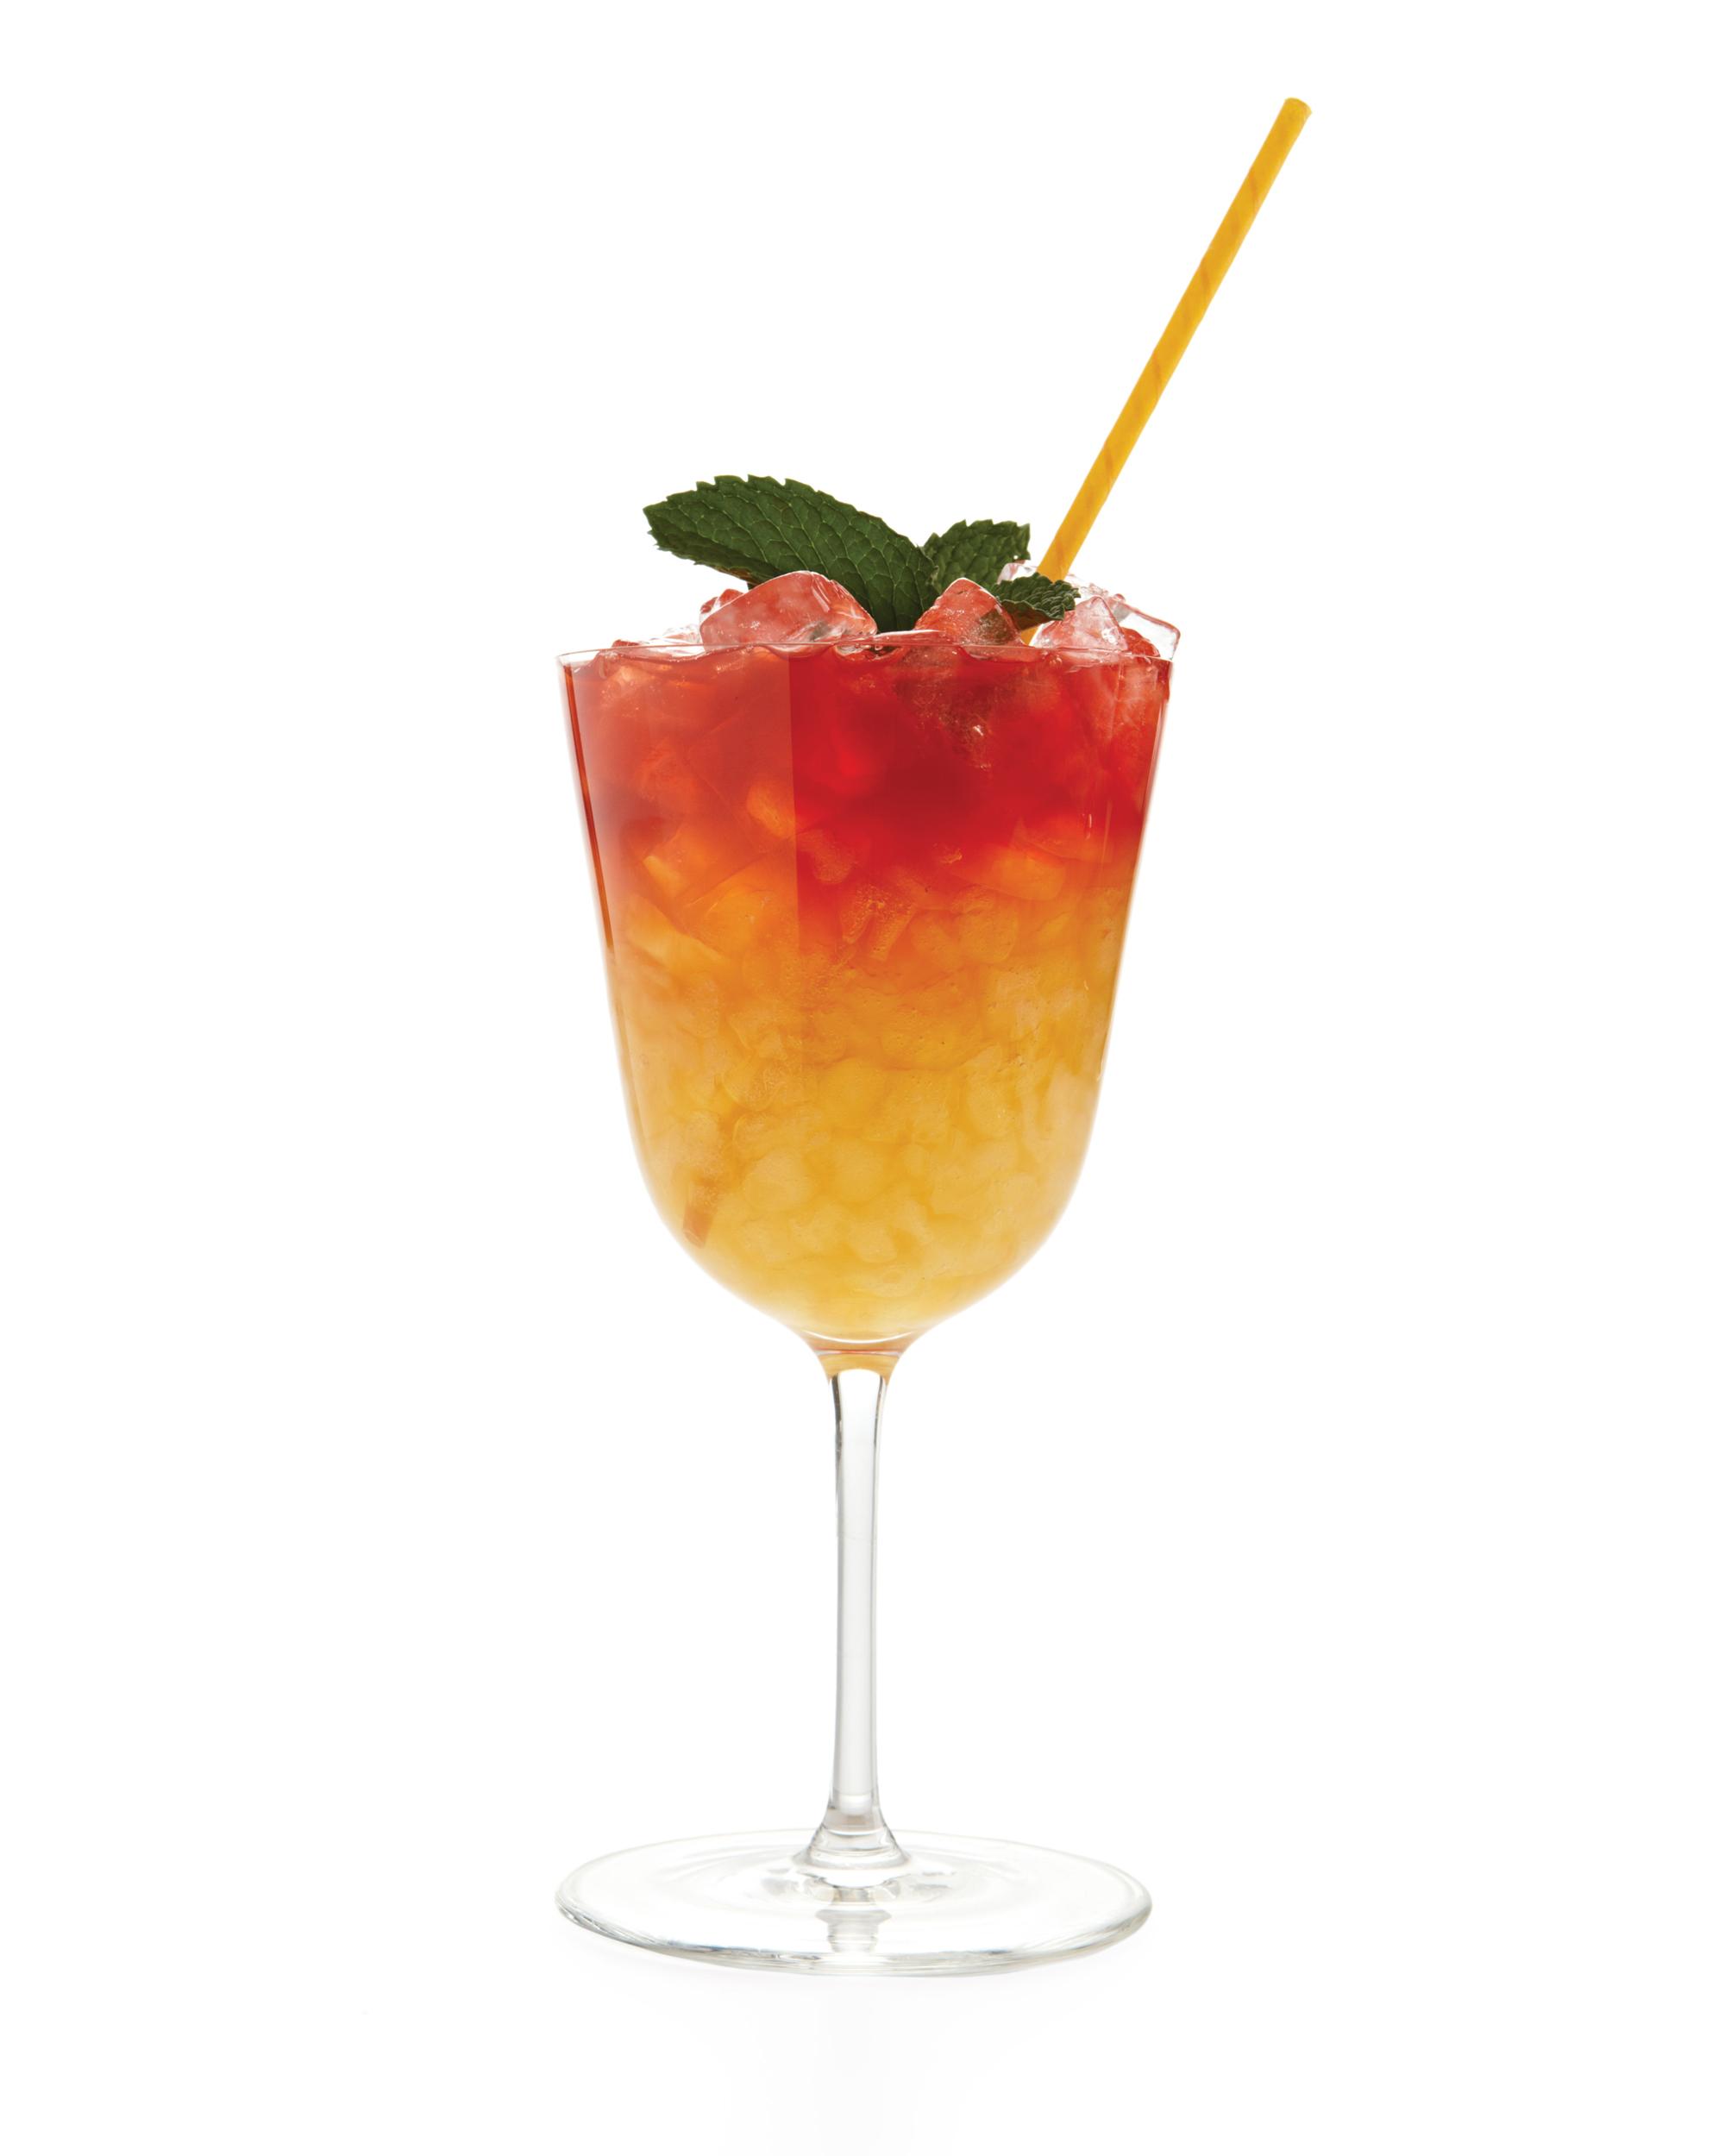 cocktaila2-sum11mwd107159.jpg